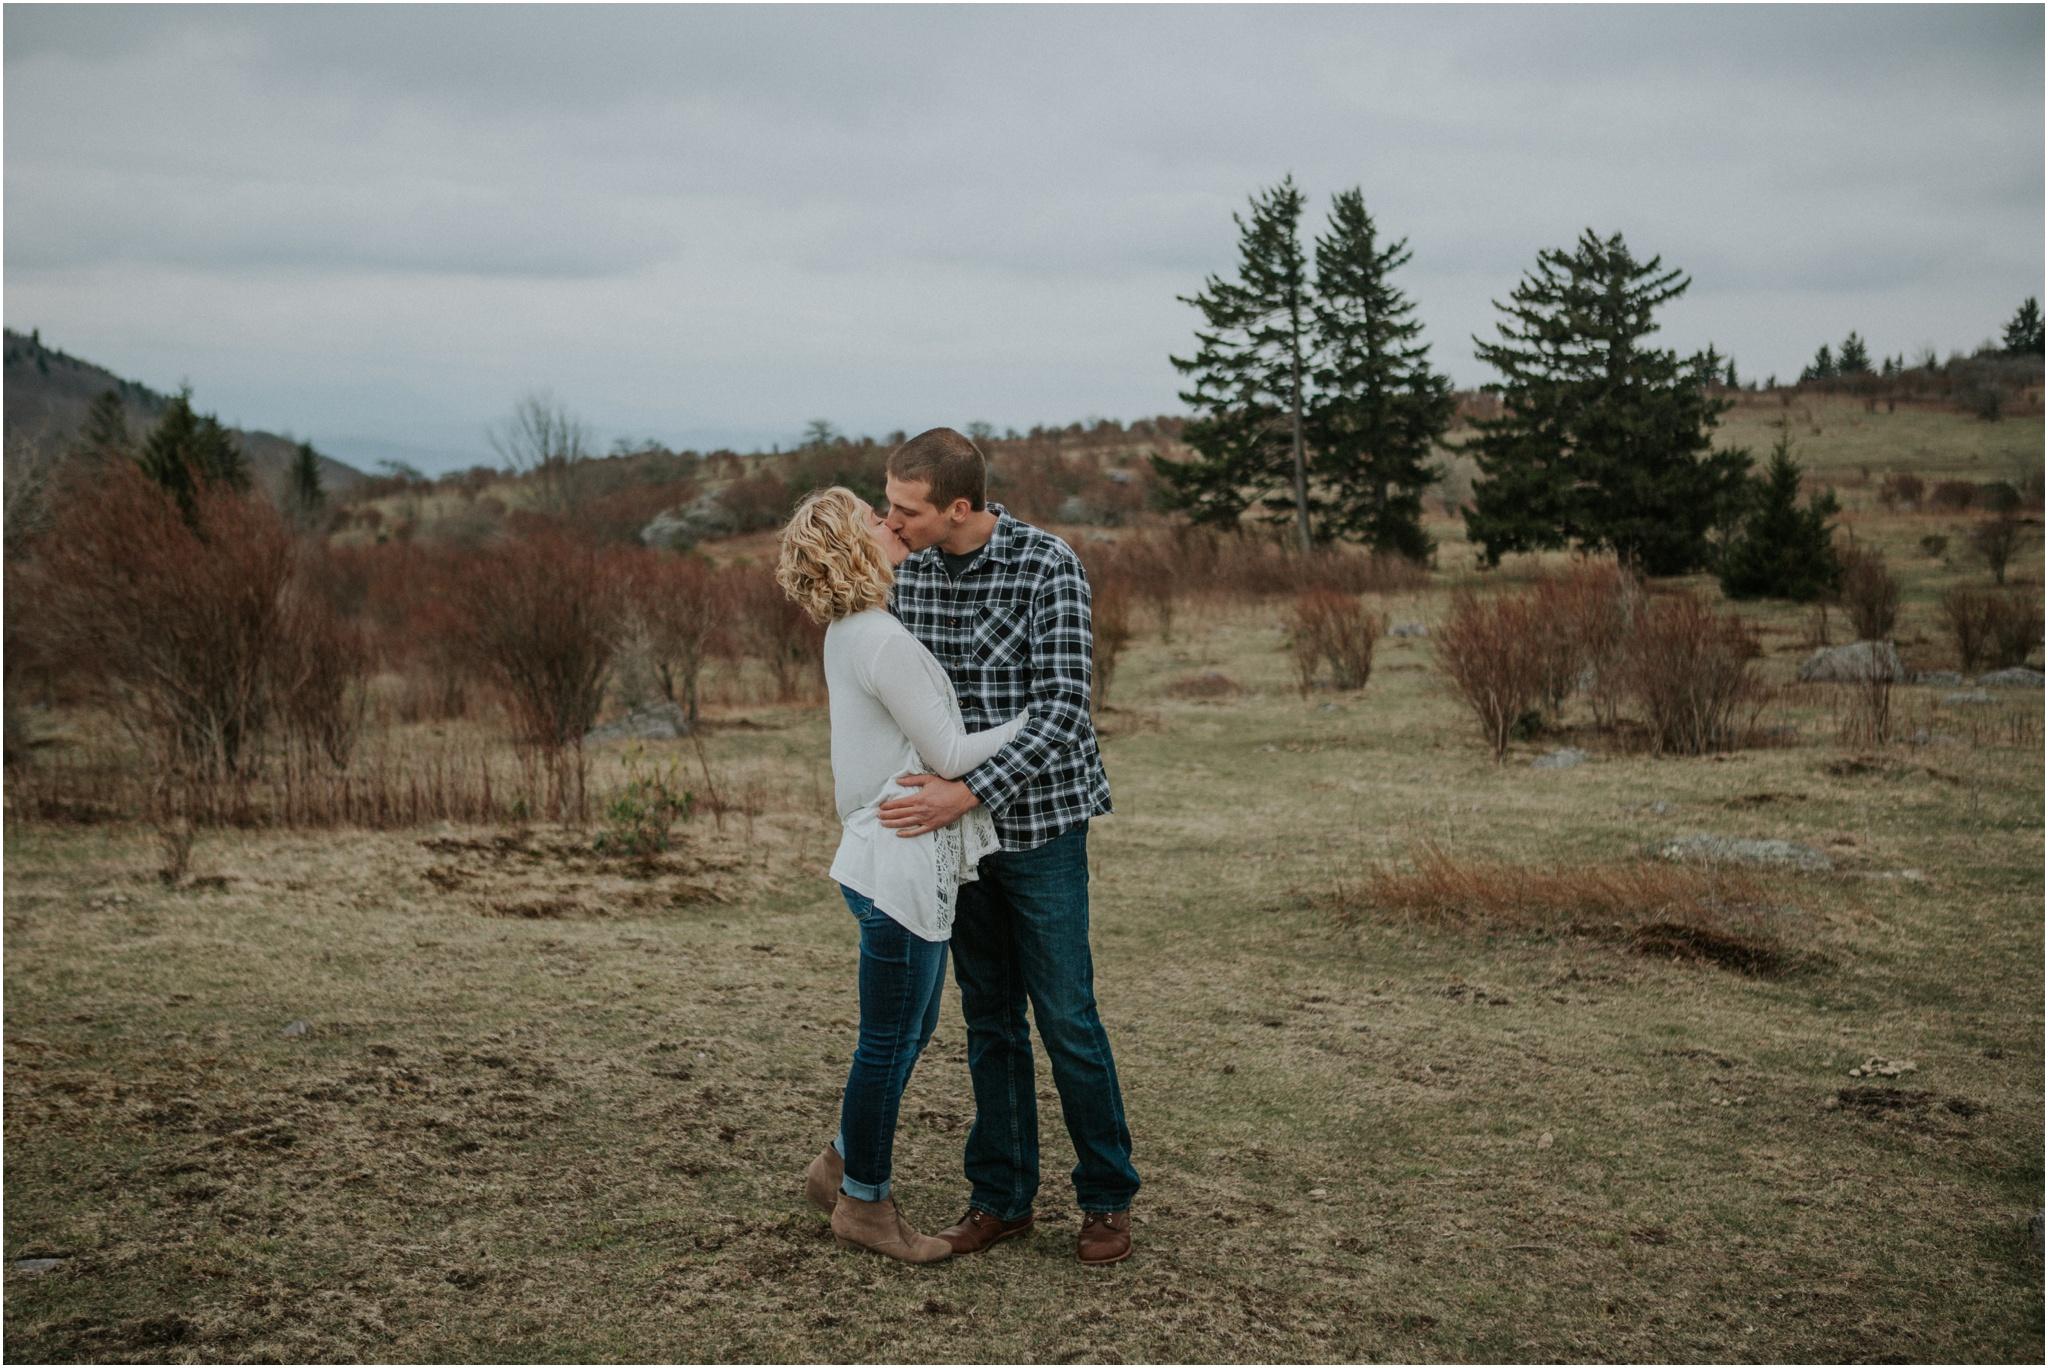 grayson-highlands-engagement-session-foggy-mountain-rustic-appalachian-virginia-katy-sergent-photography_0016.jpg